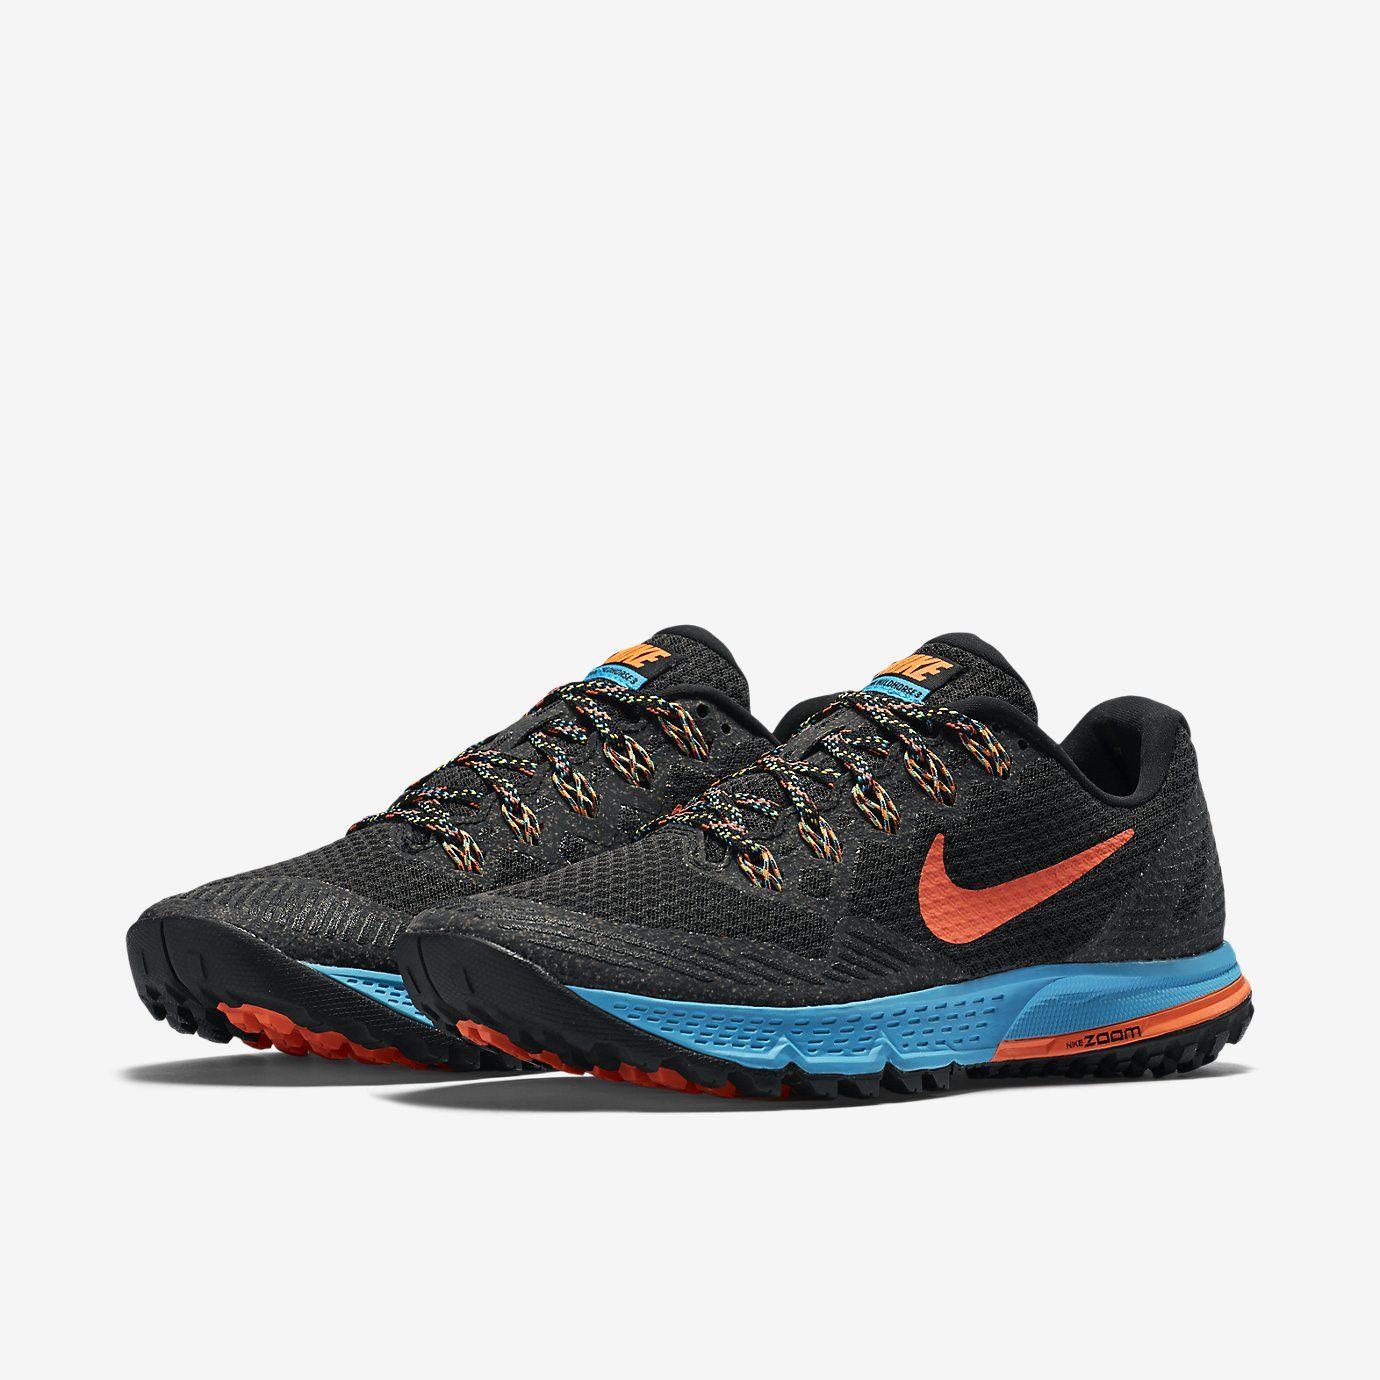 215ee01bb00 Nike Air Zoom Wildhorse 3 Women s Running Shoe. Nike.com